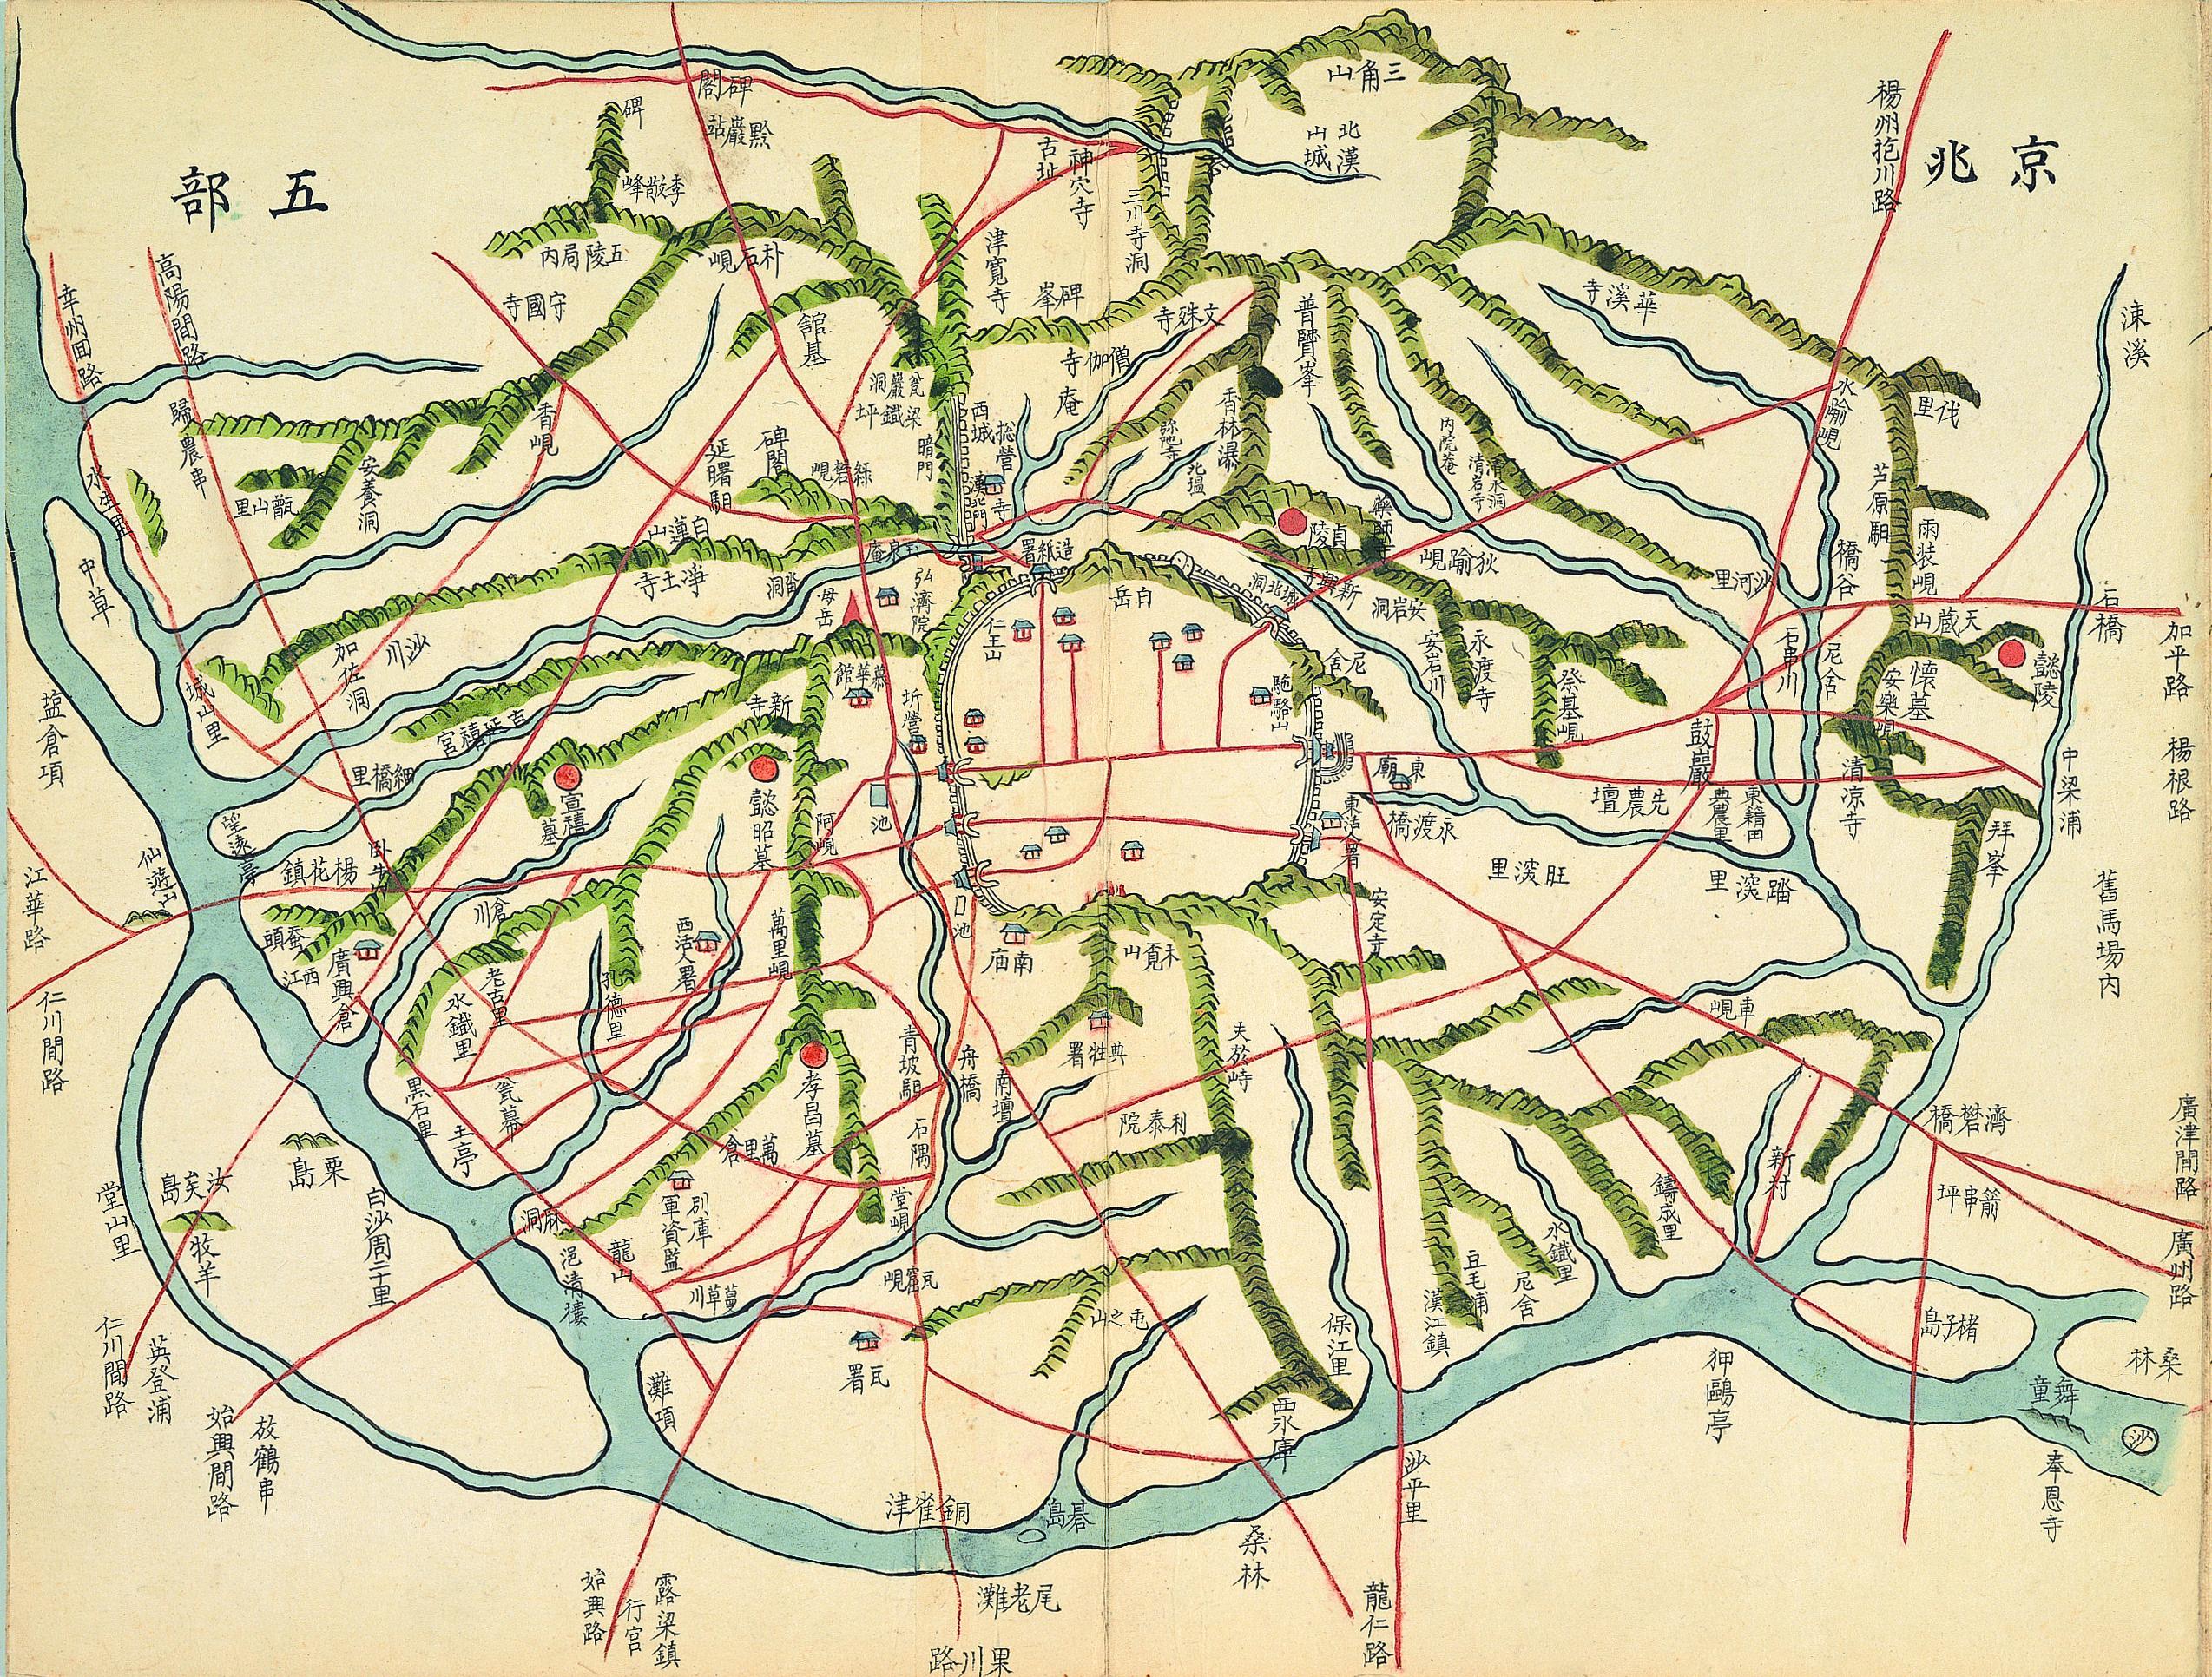 https://upload.wikimedia.org/wikipedia/commons/5/5b/Gyeongjoobudo.jpg